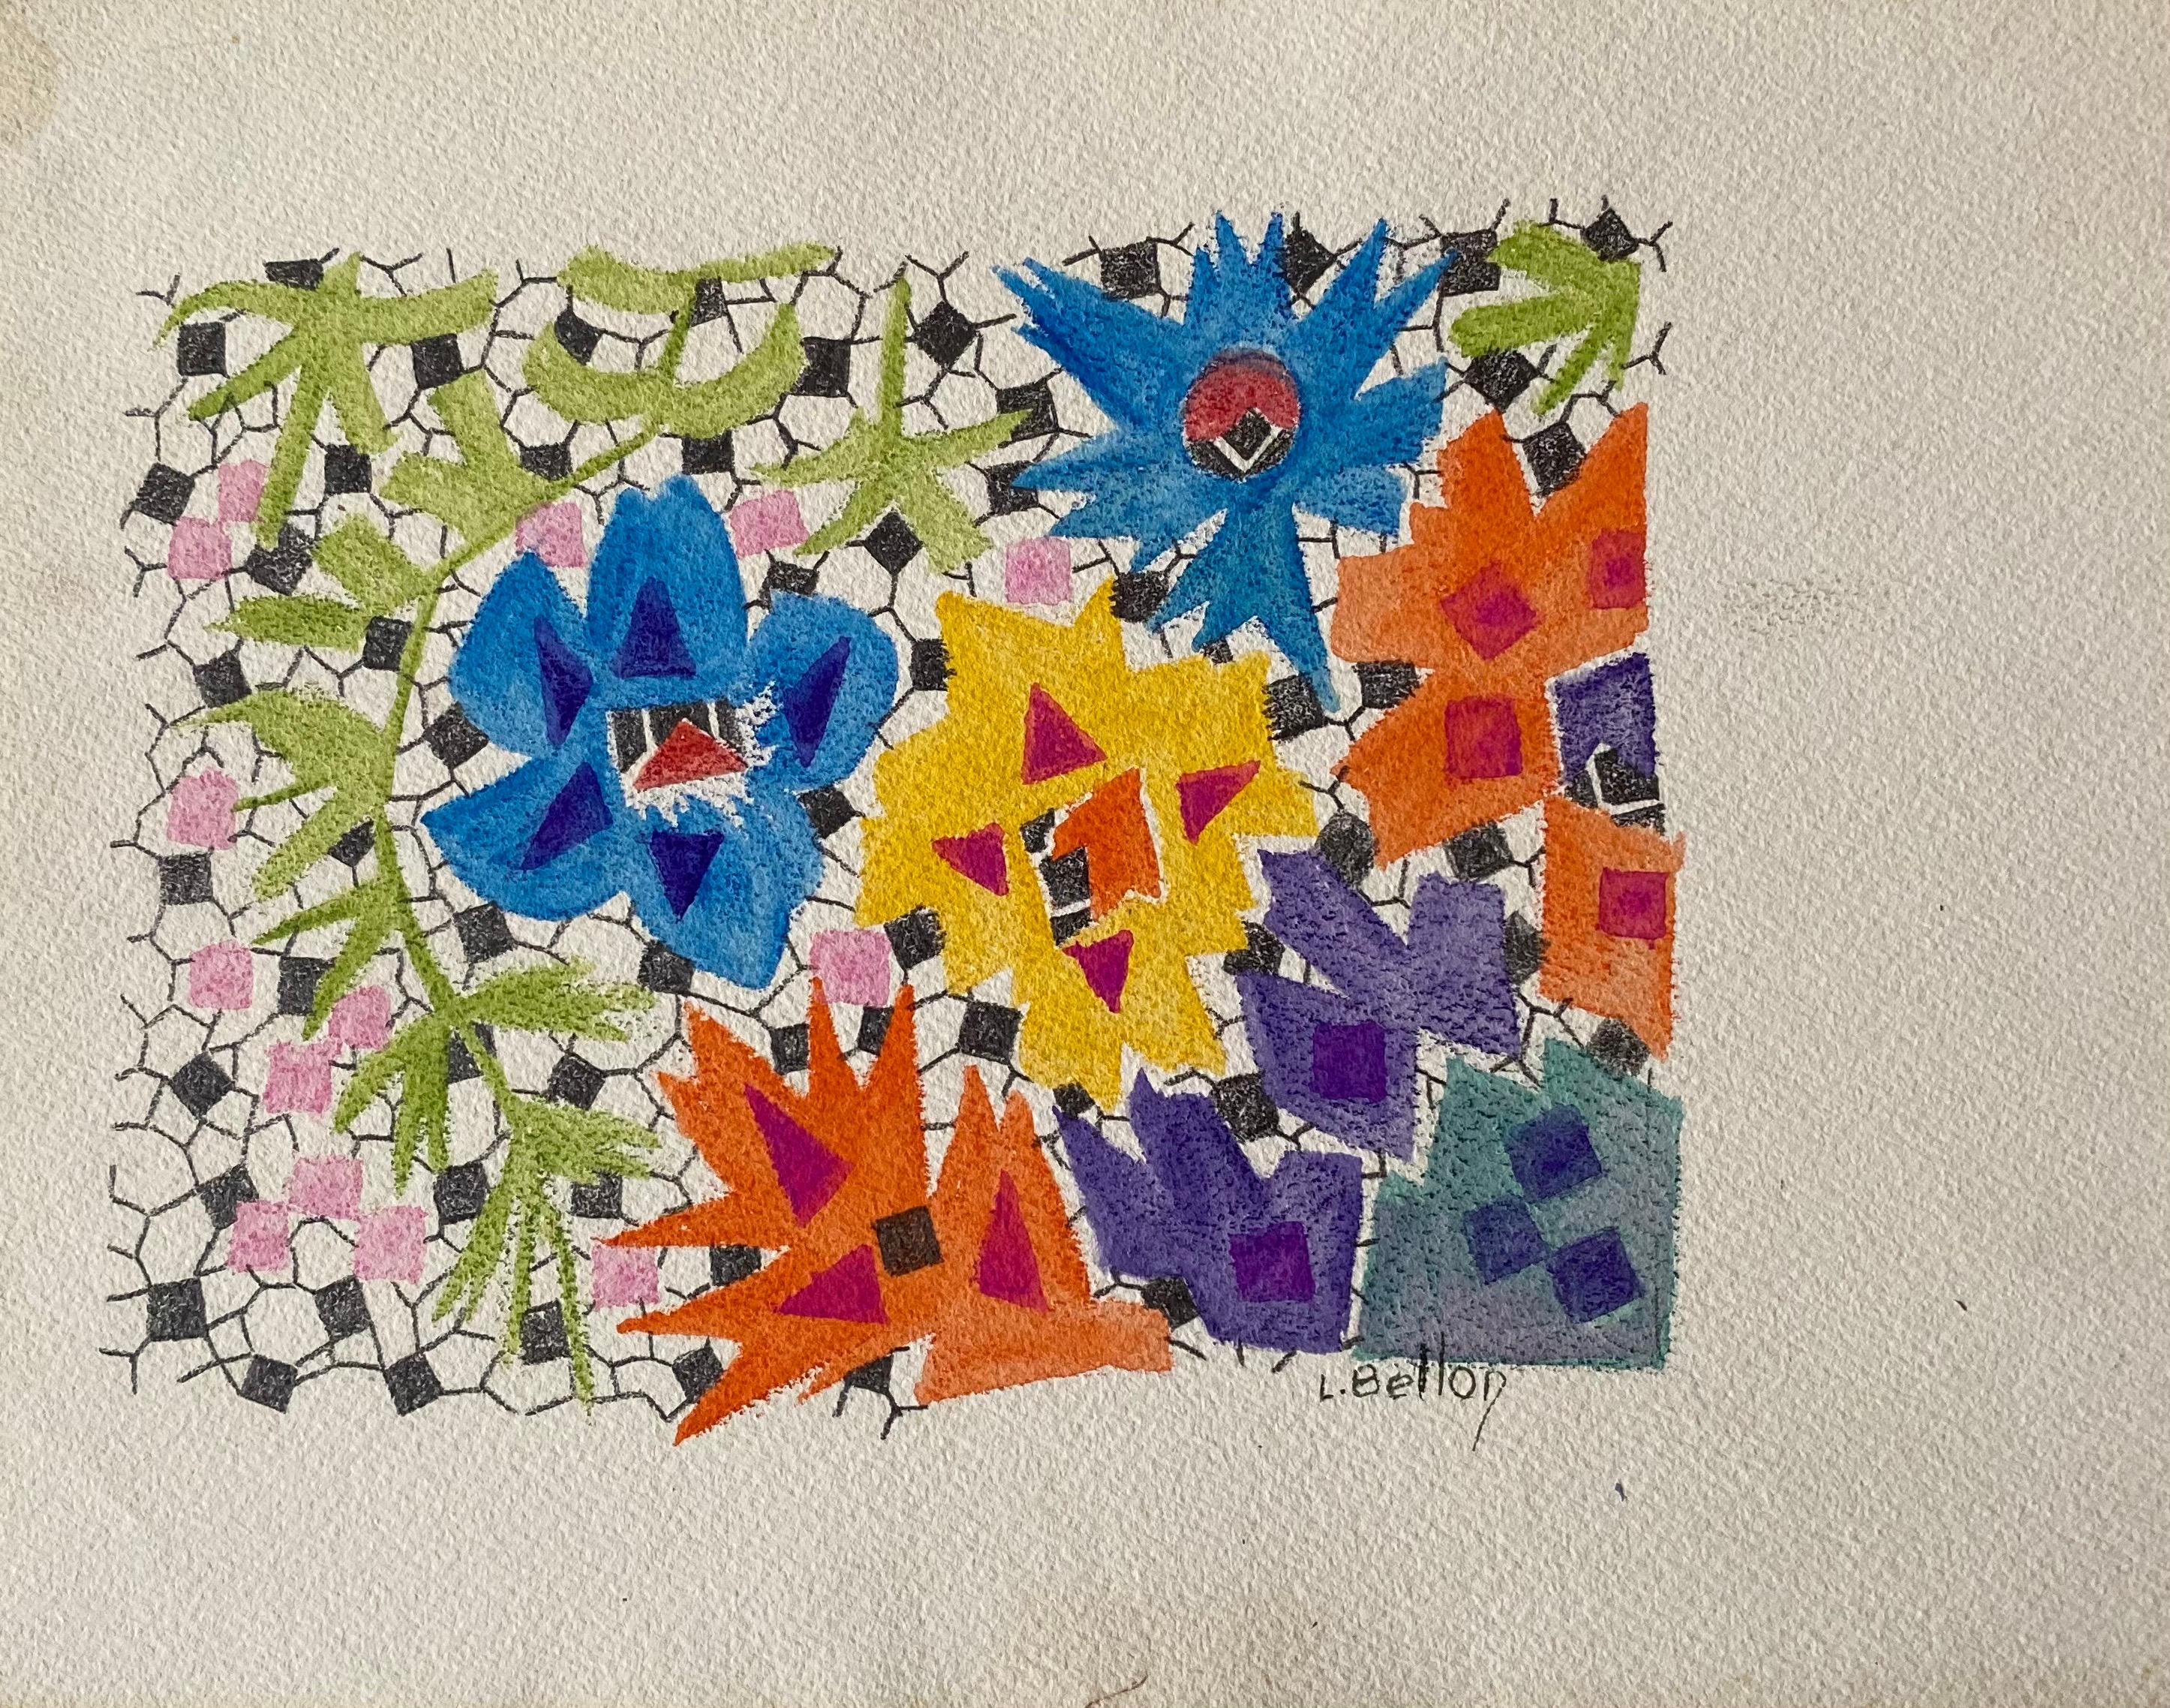 1940's French Post Impressionist artist Abstract Artwork Design original